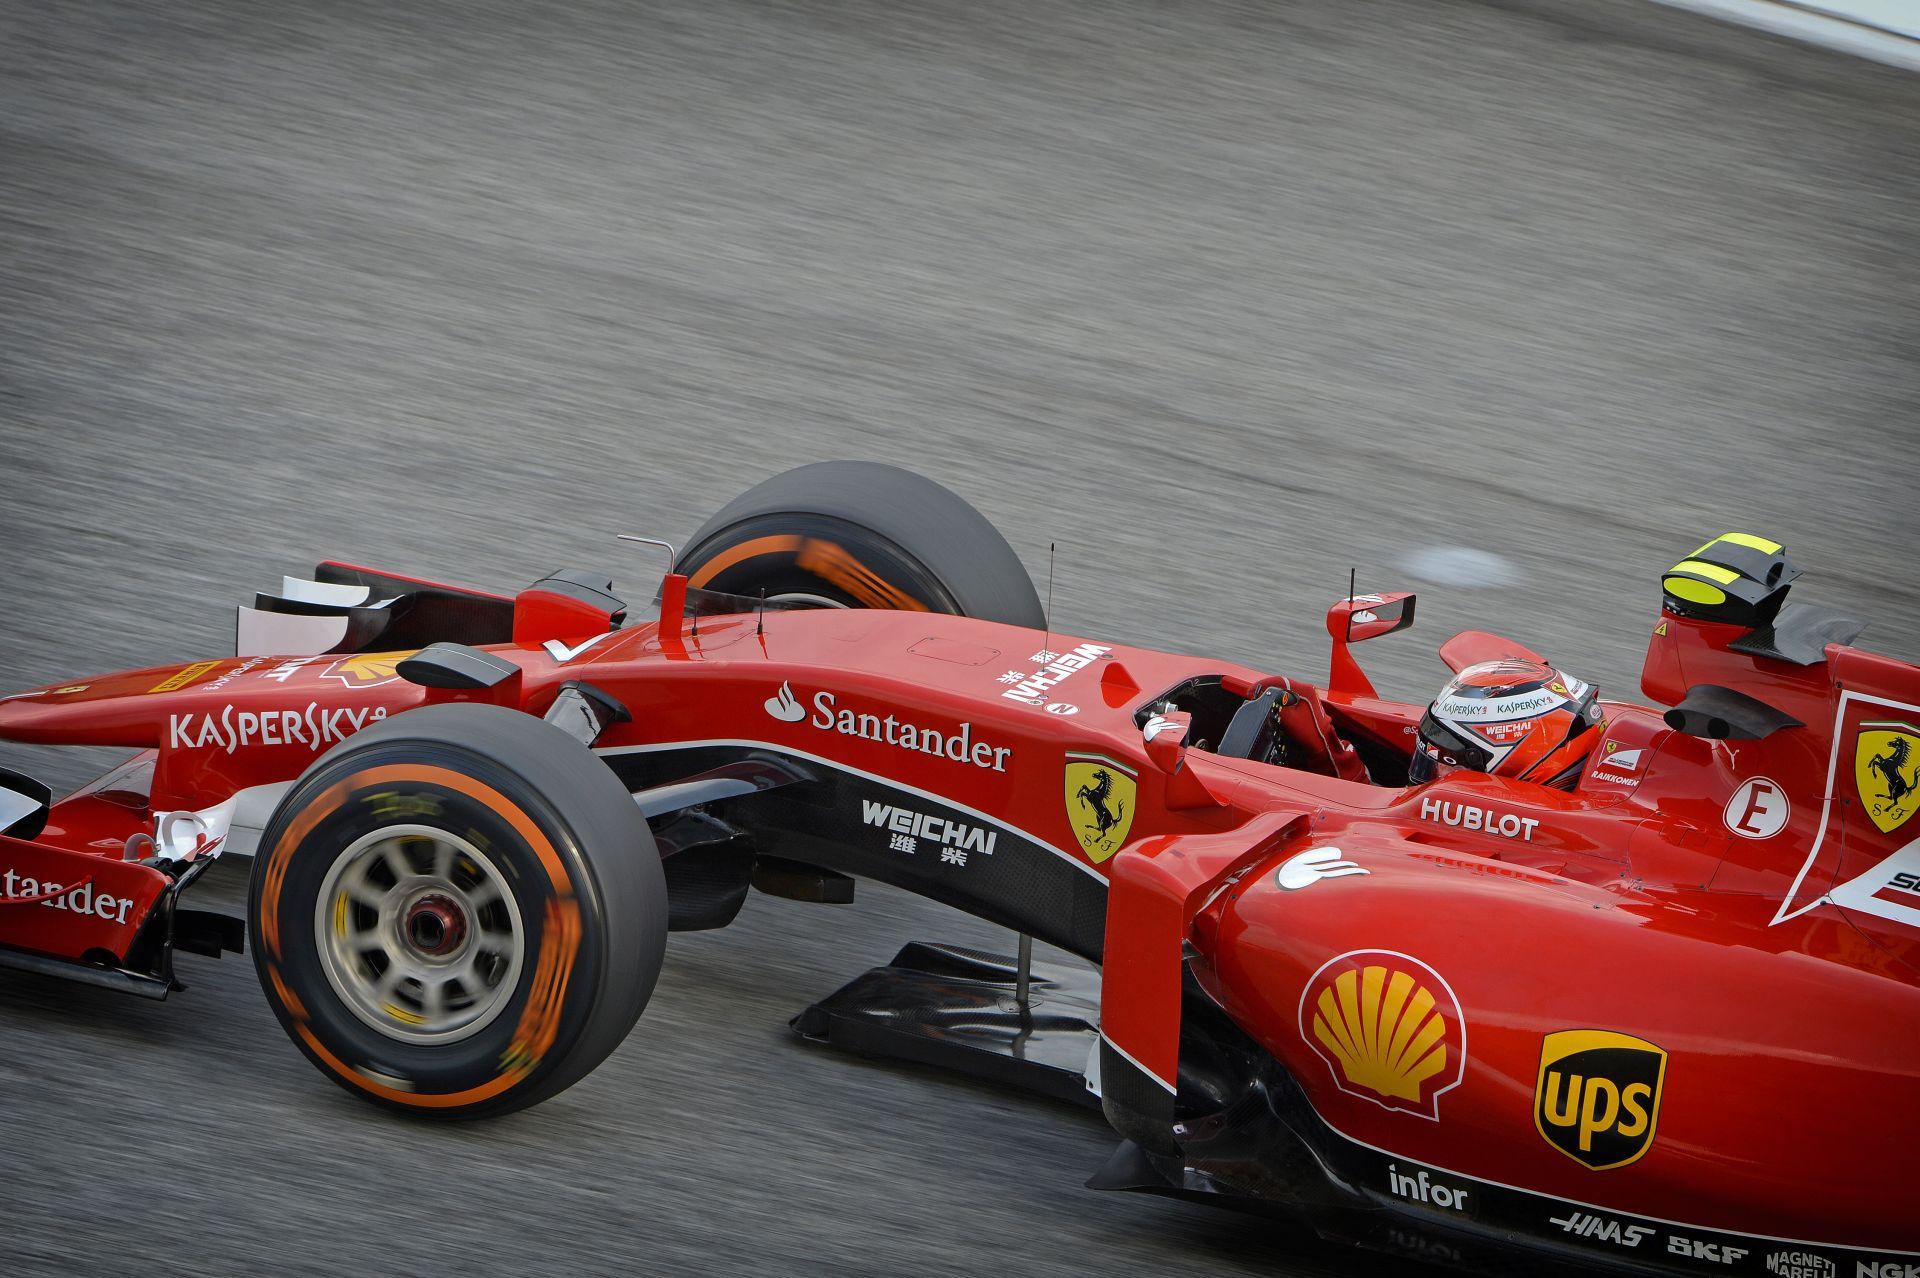 Kimi kissé bepörgött Grosjeanra Malajziában